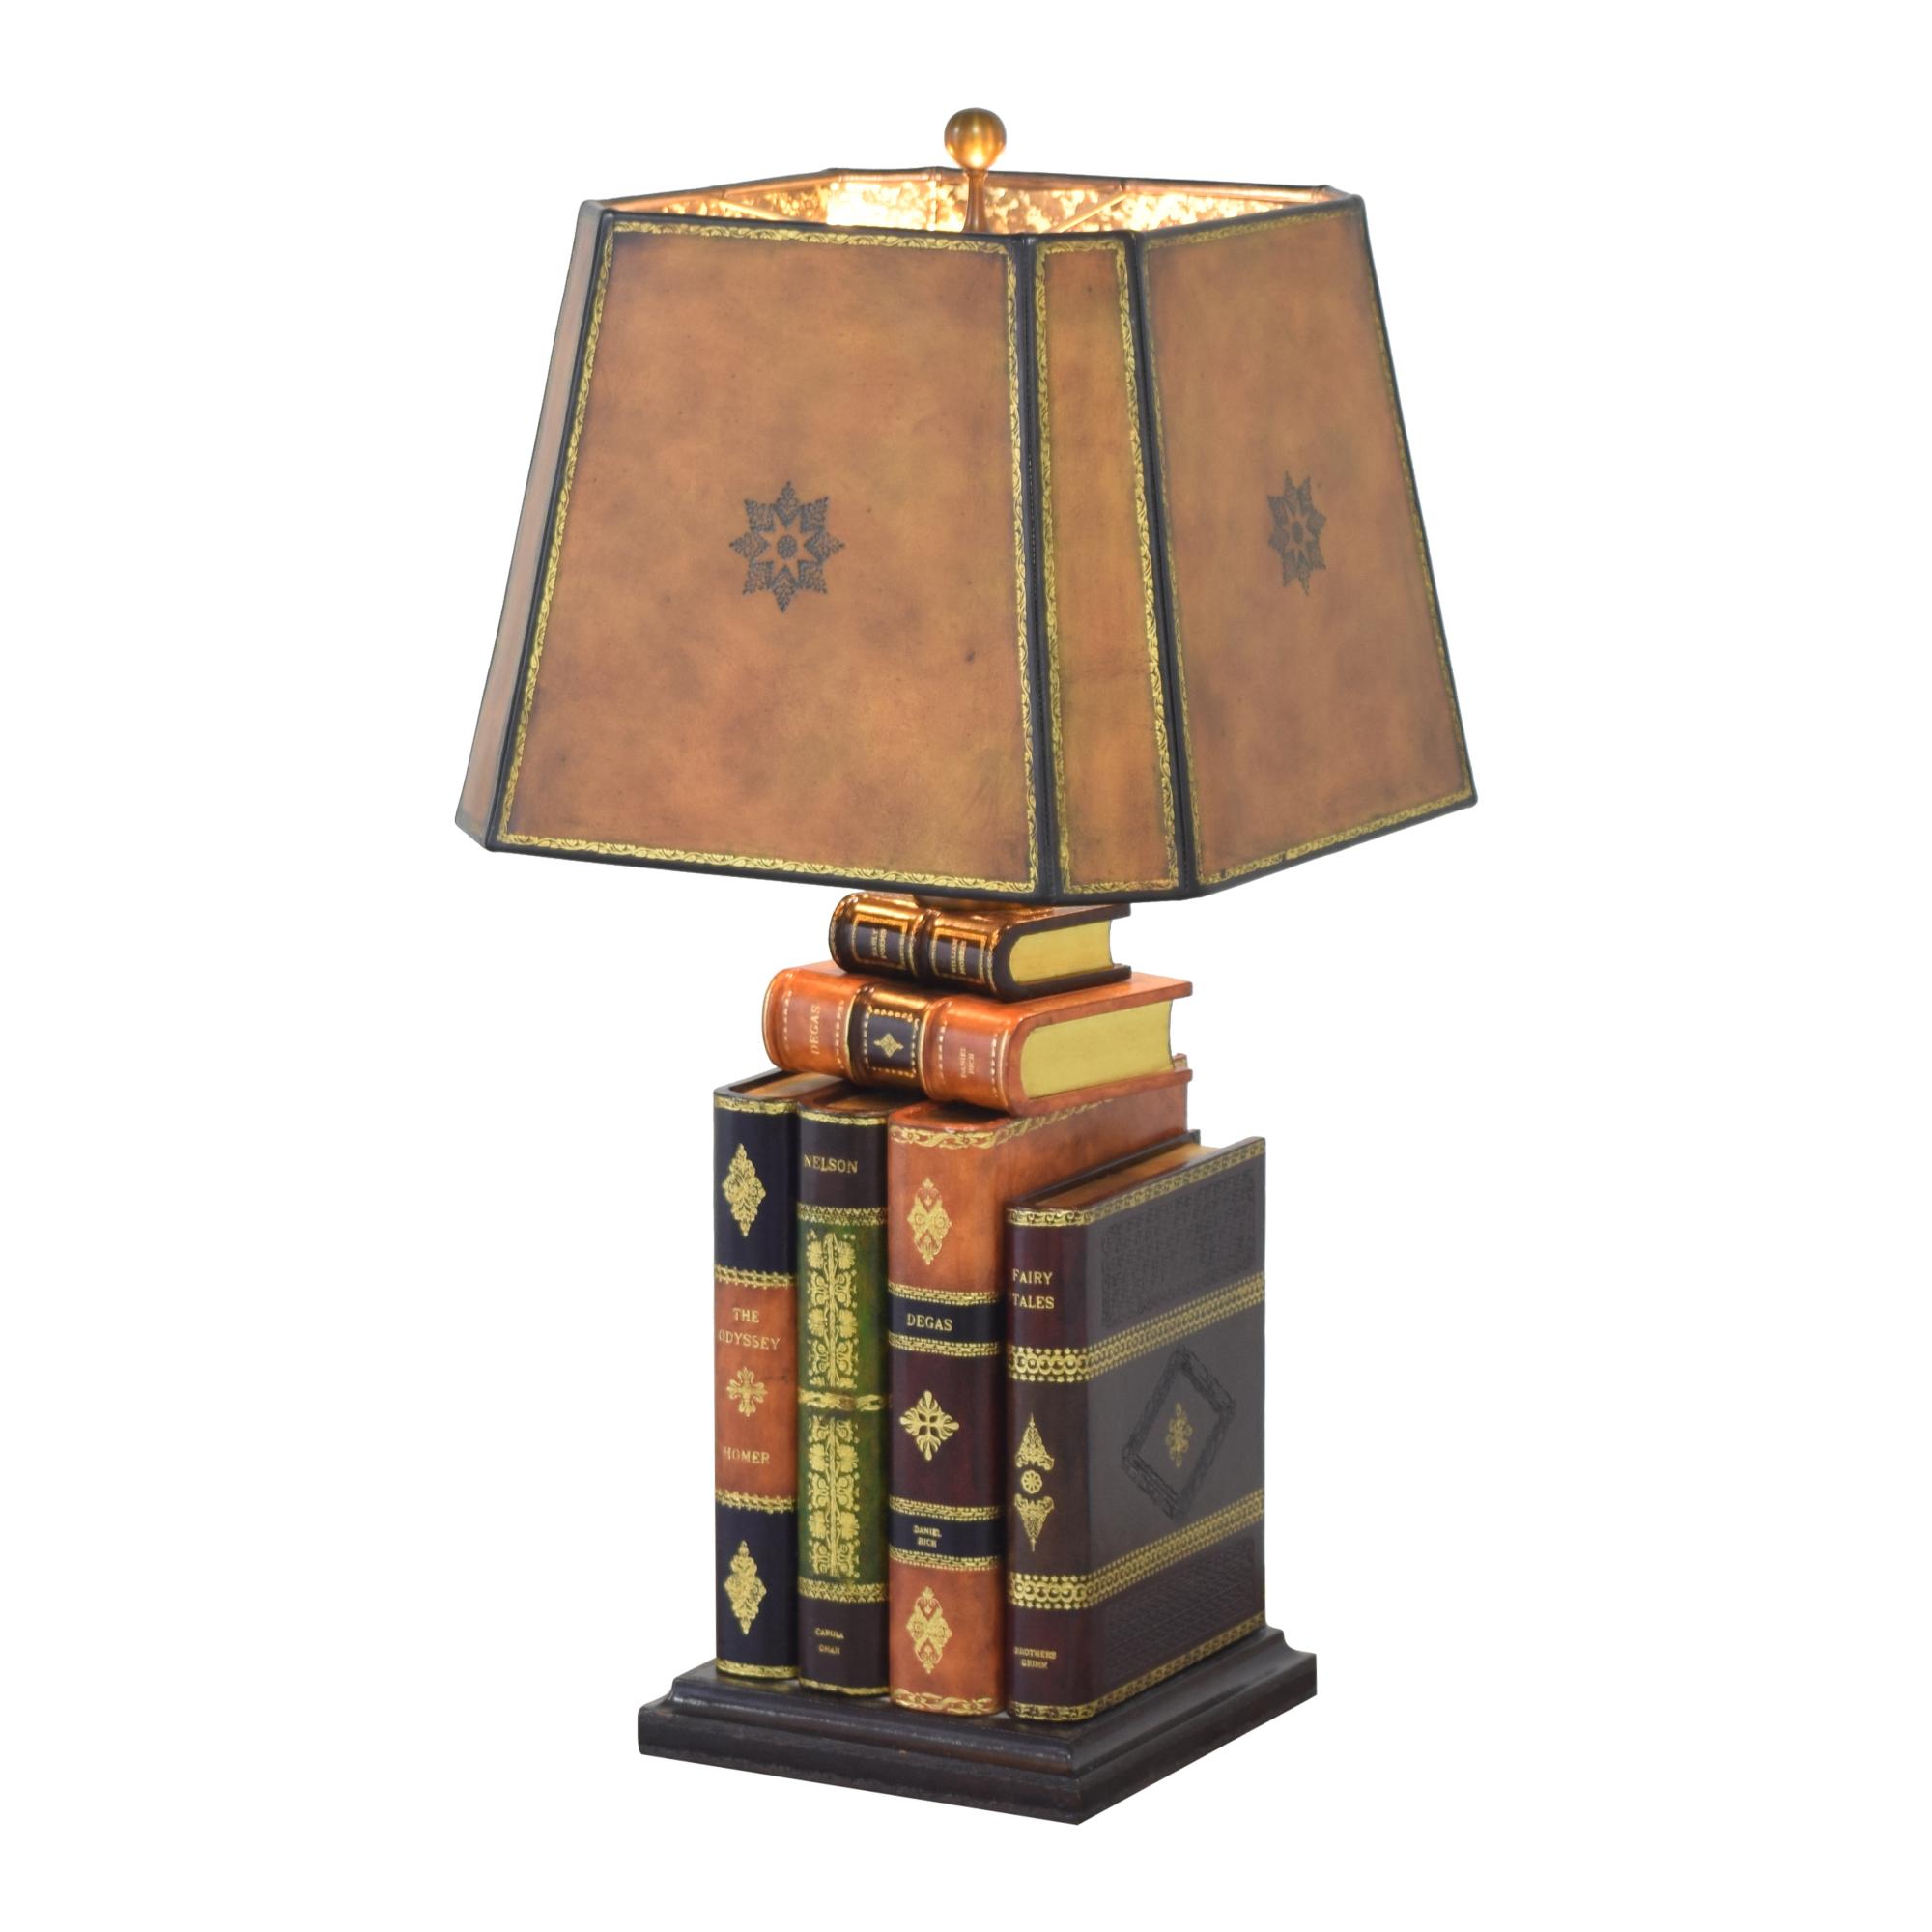 Maitland-Smith Maitland-Smith Library Table Lamp ct